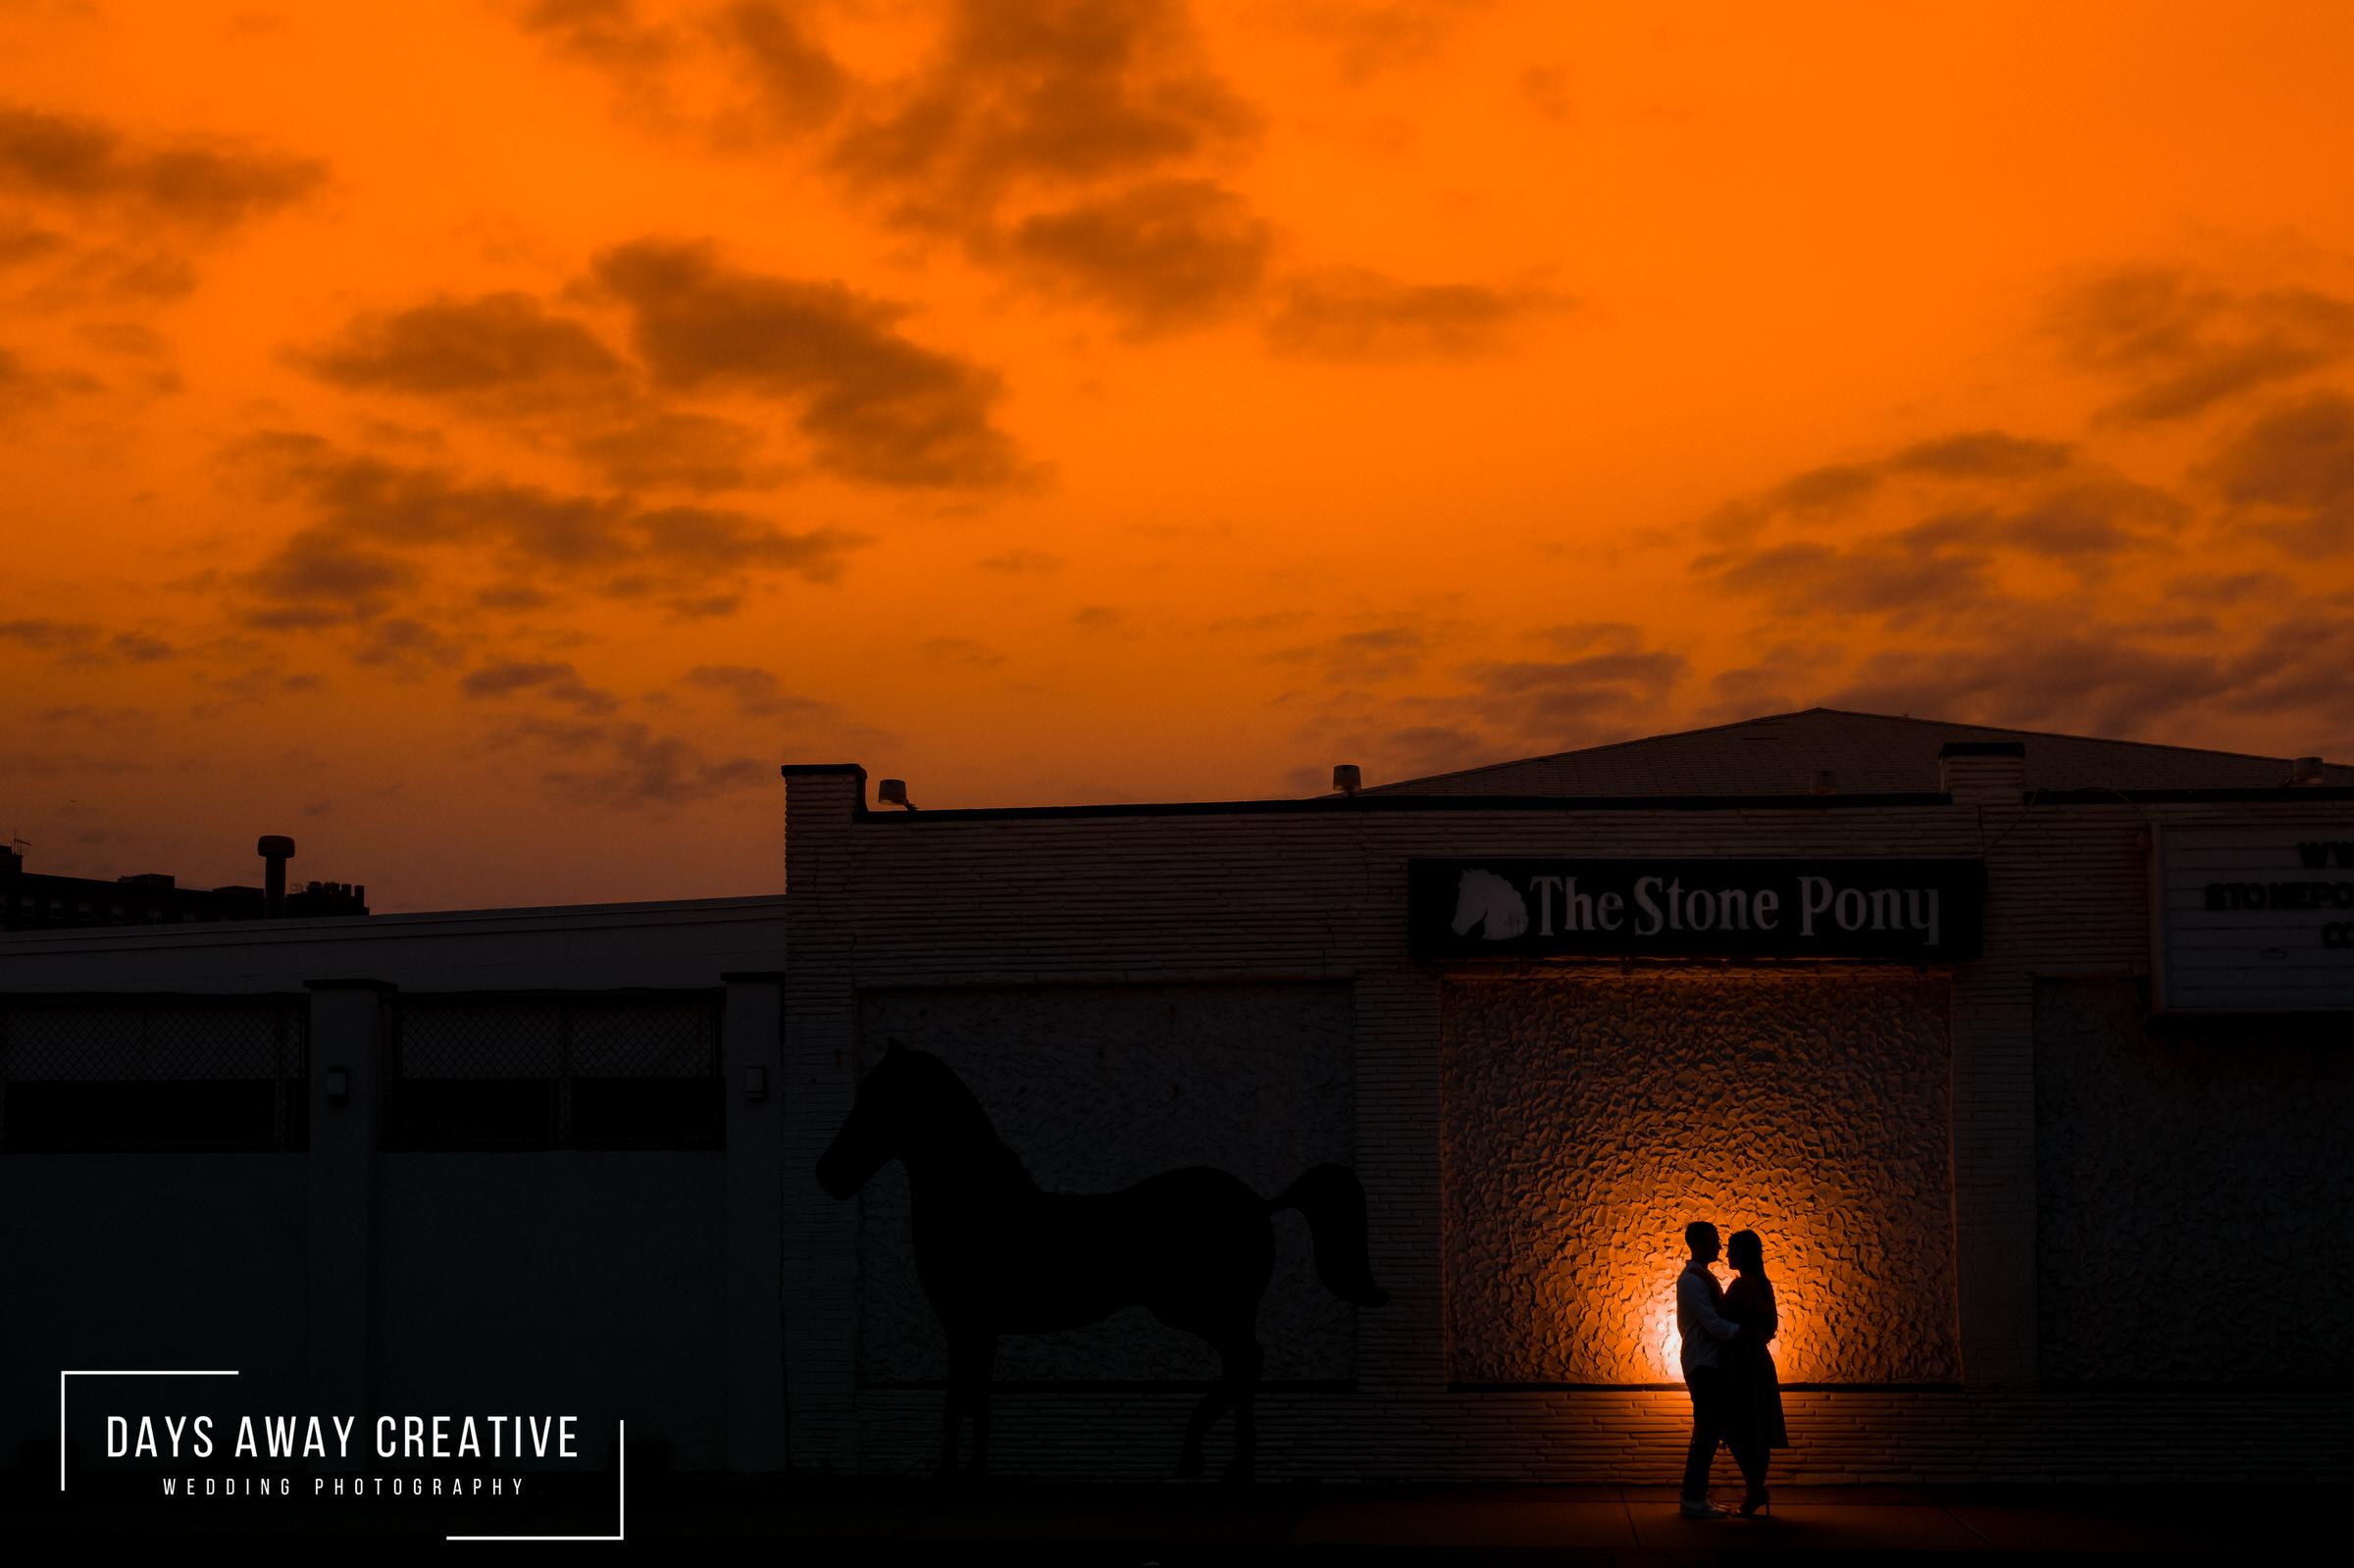 Days Away Creative Portfolio Image